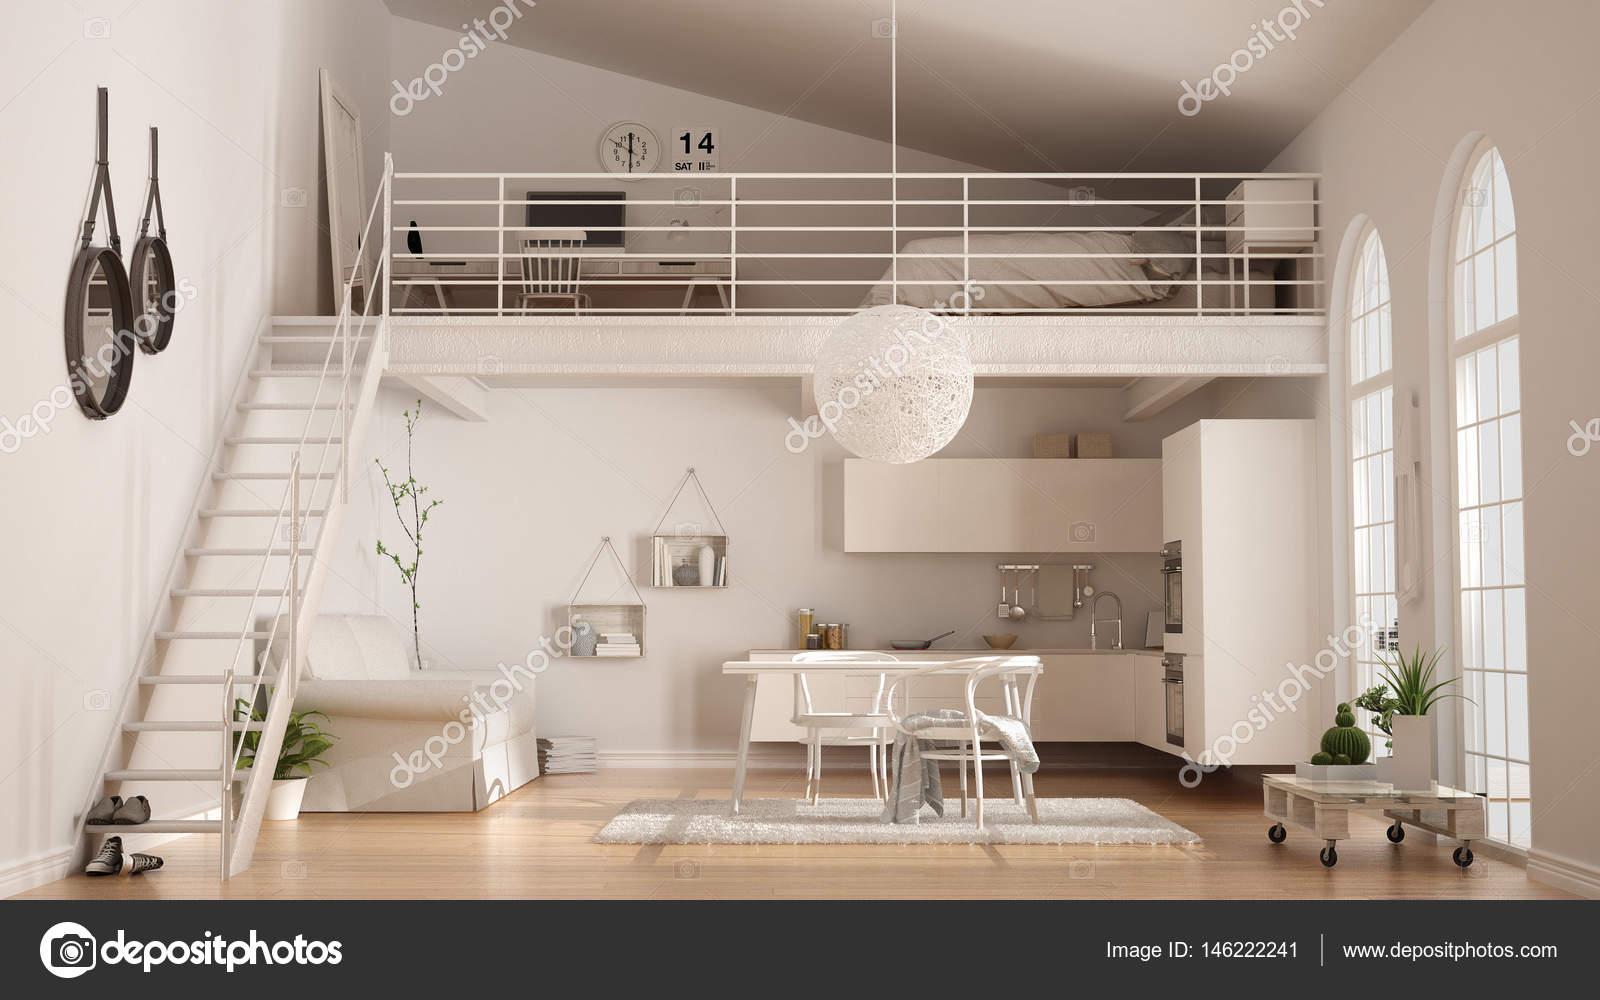 Scandinavian Minimalist Loft One Room Apartment With White Kitc